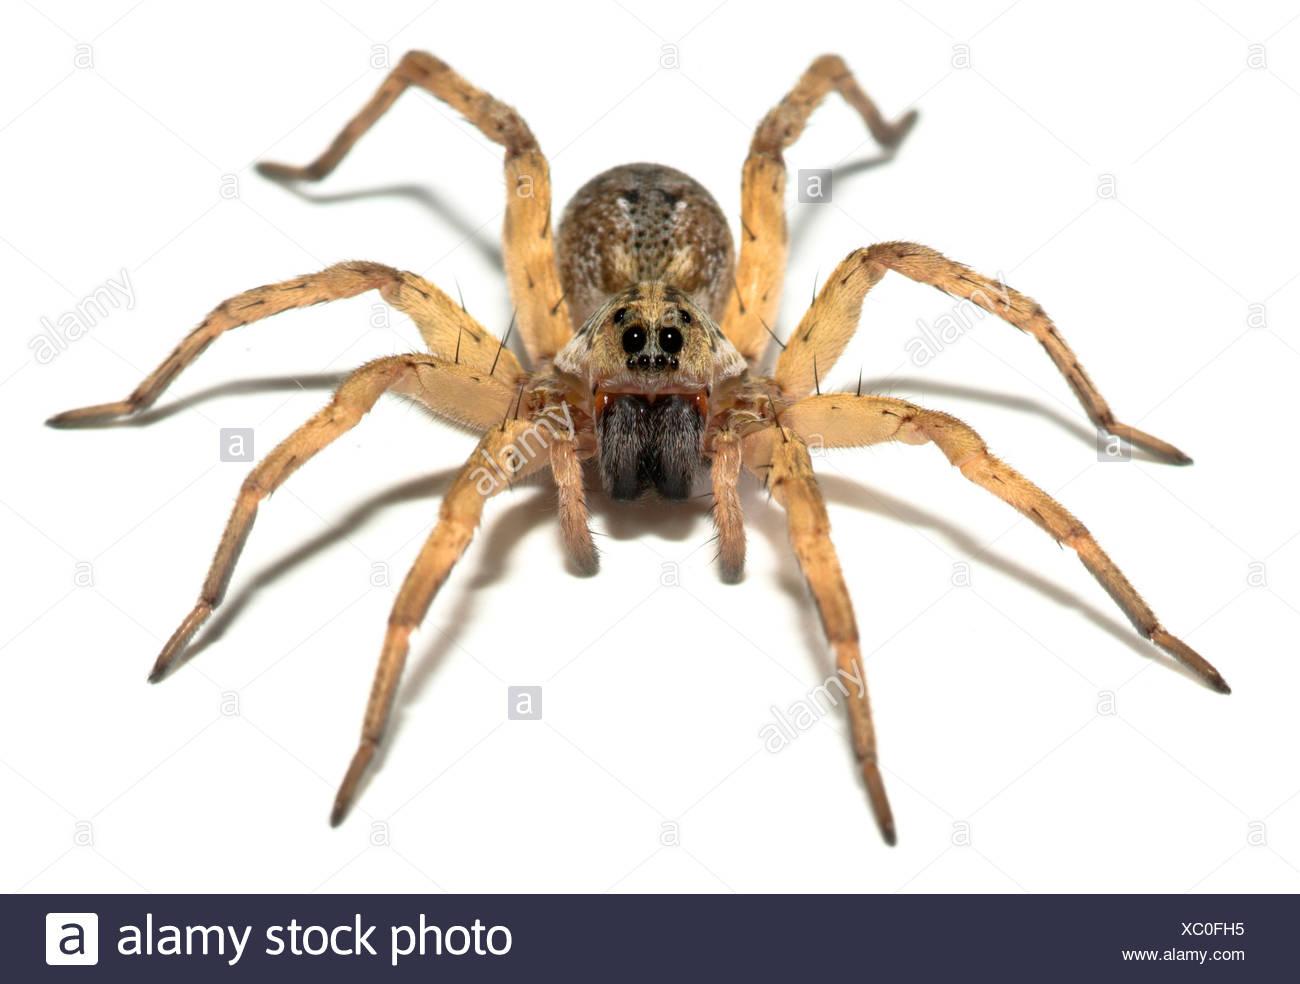 CAROLINA WOLF SPIDER (Hogna carolinensis) USA - Stock Image